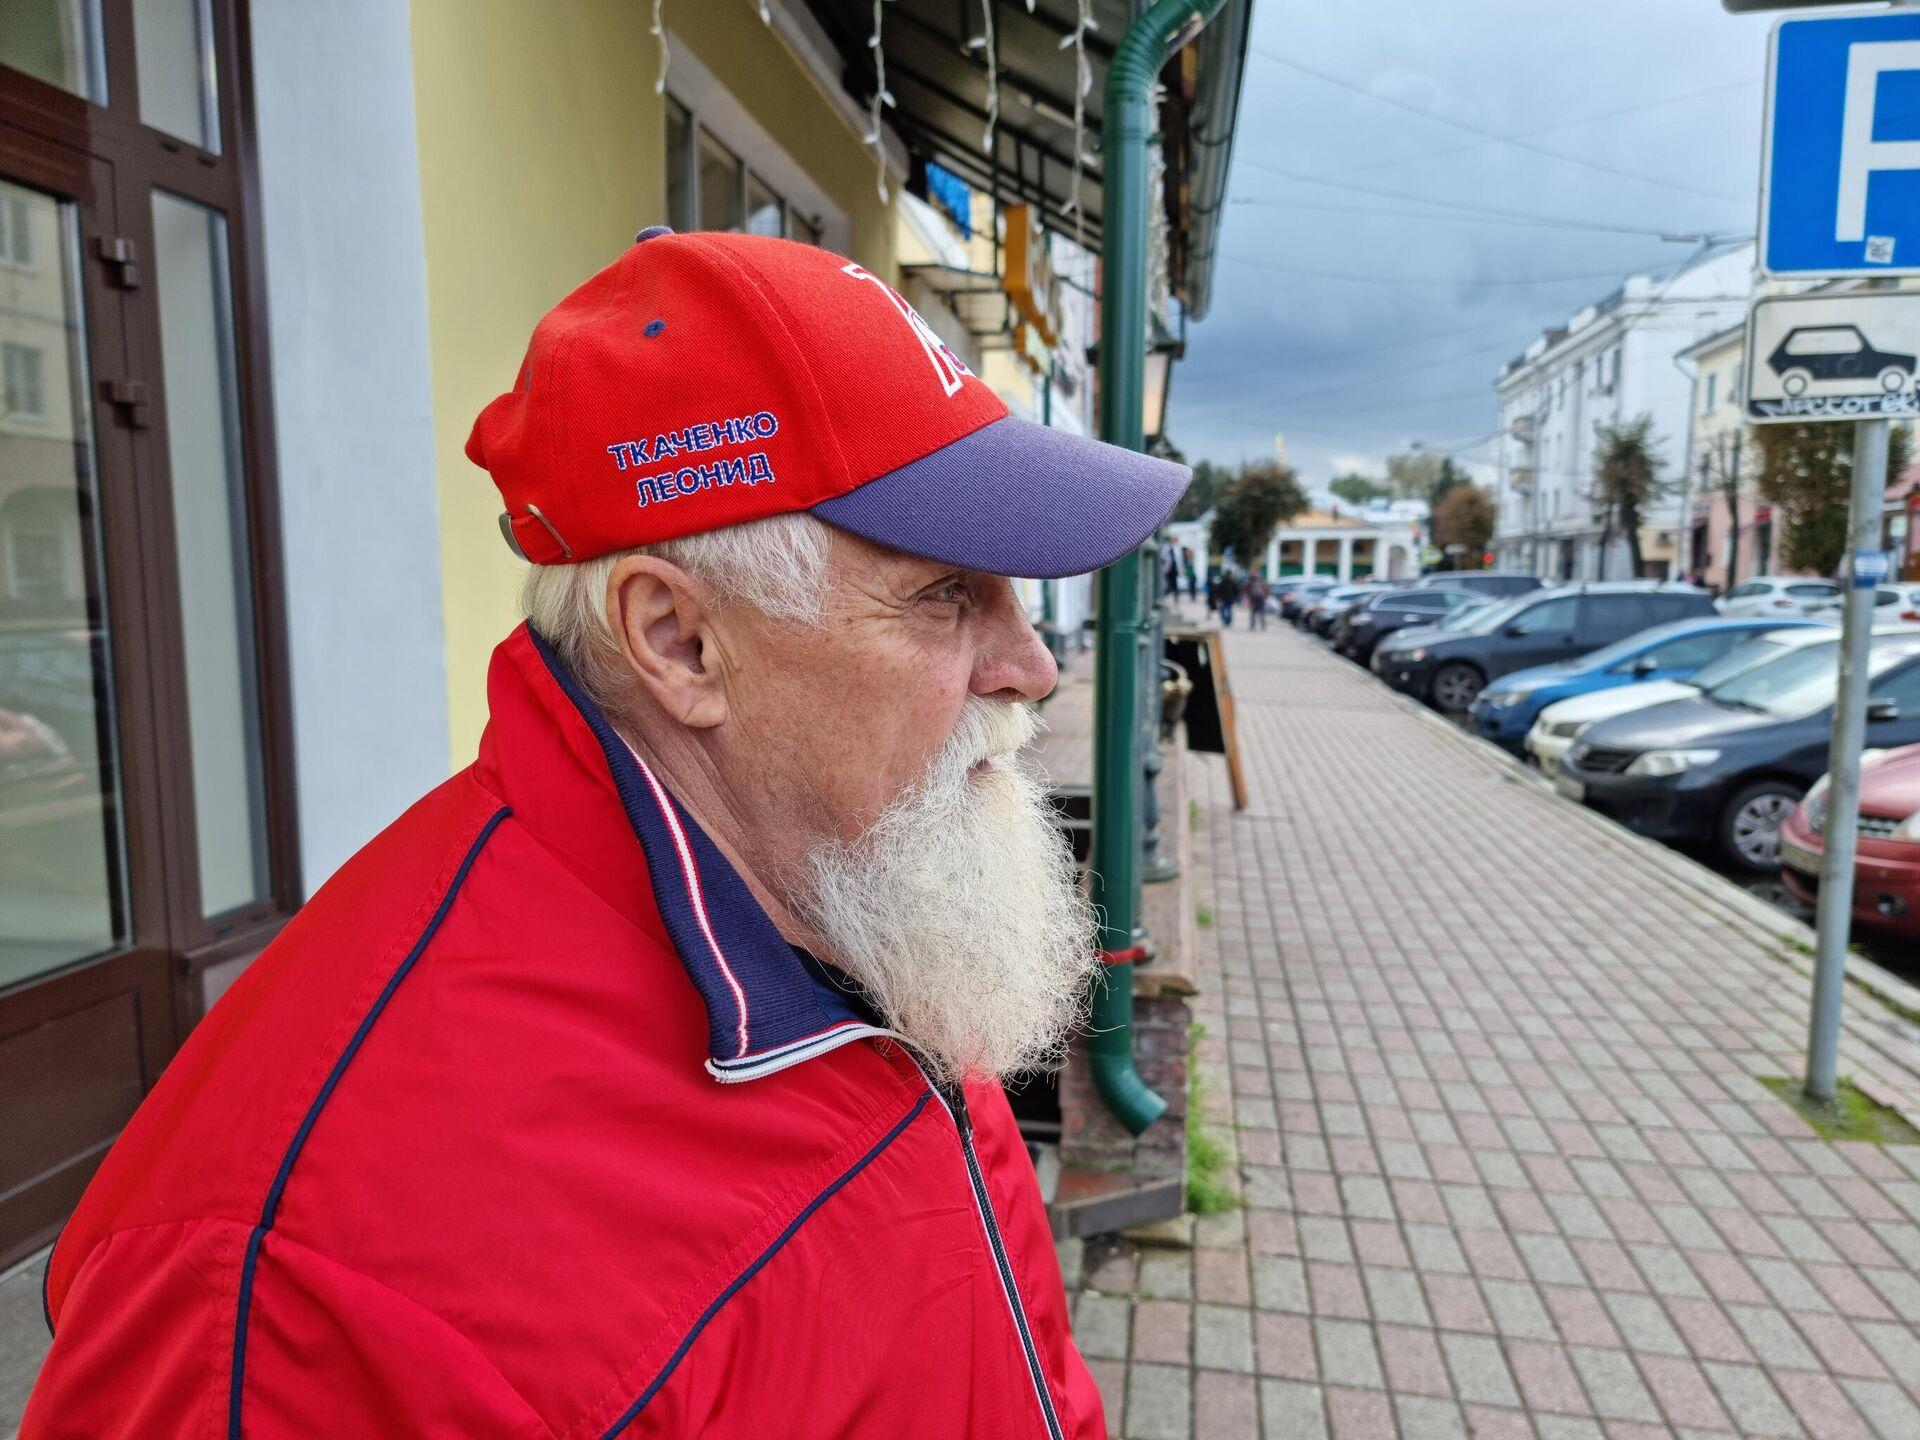 Отец хоккеиста Ивана Ткаченко Леонид Ткаченко - РИА Новости, 1920, 05.09.2021